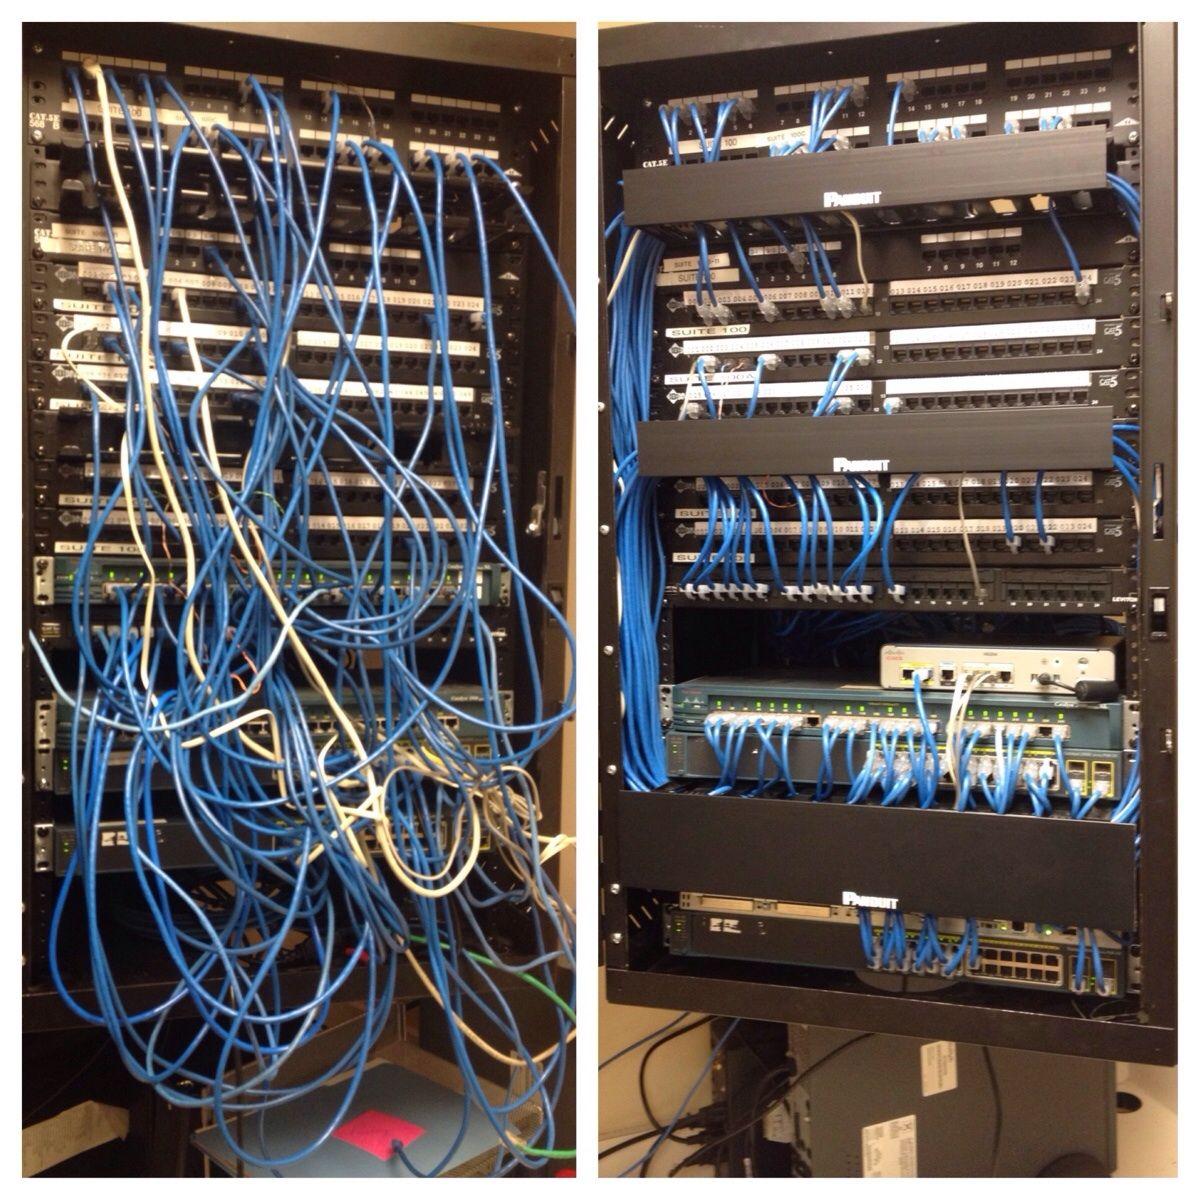 small rack rewire racks and wiring pinterest rh pinterest com Messy Wiring Closet Messy Wiring Closet